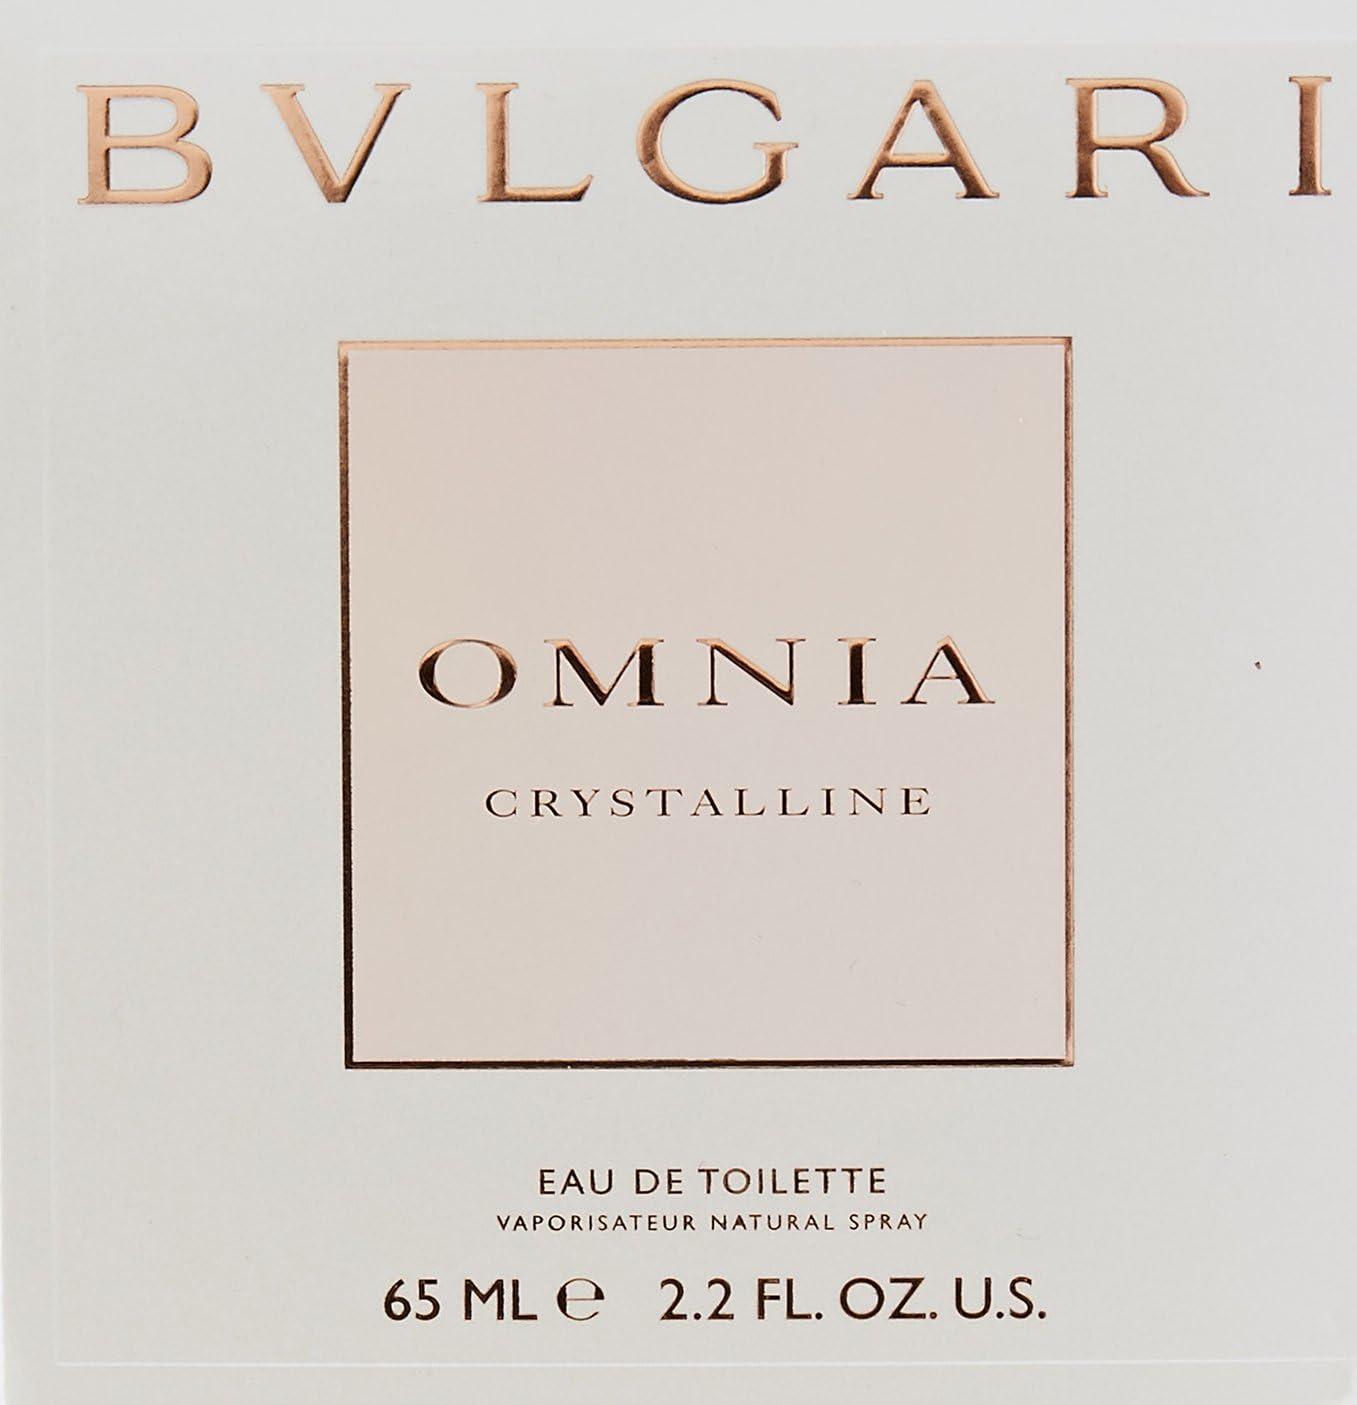 Bvlgari Bvlgari Omnia Crystalline Candy Shop Limited Edition